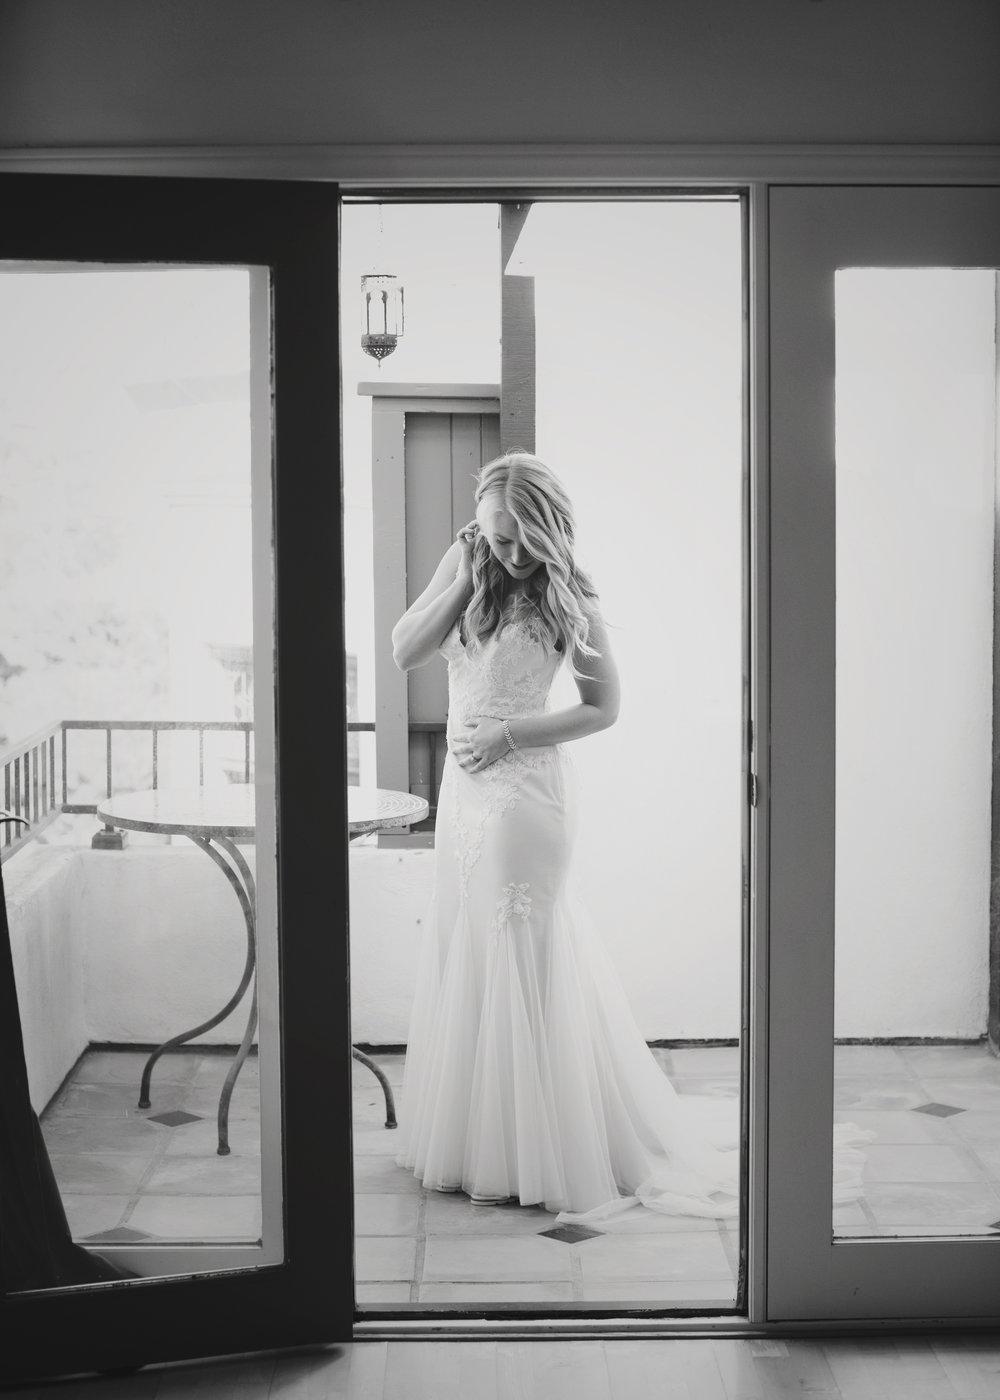 Martin-Johnson-House-Wedding-San-Diego-Wedding-Photographer-La-Jolla_003.JPG